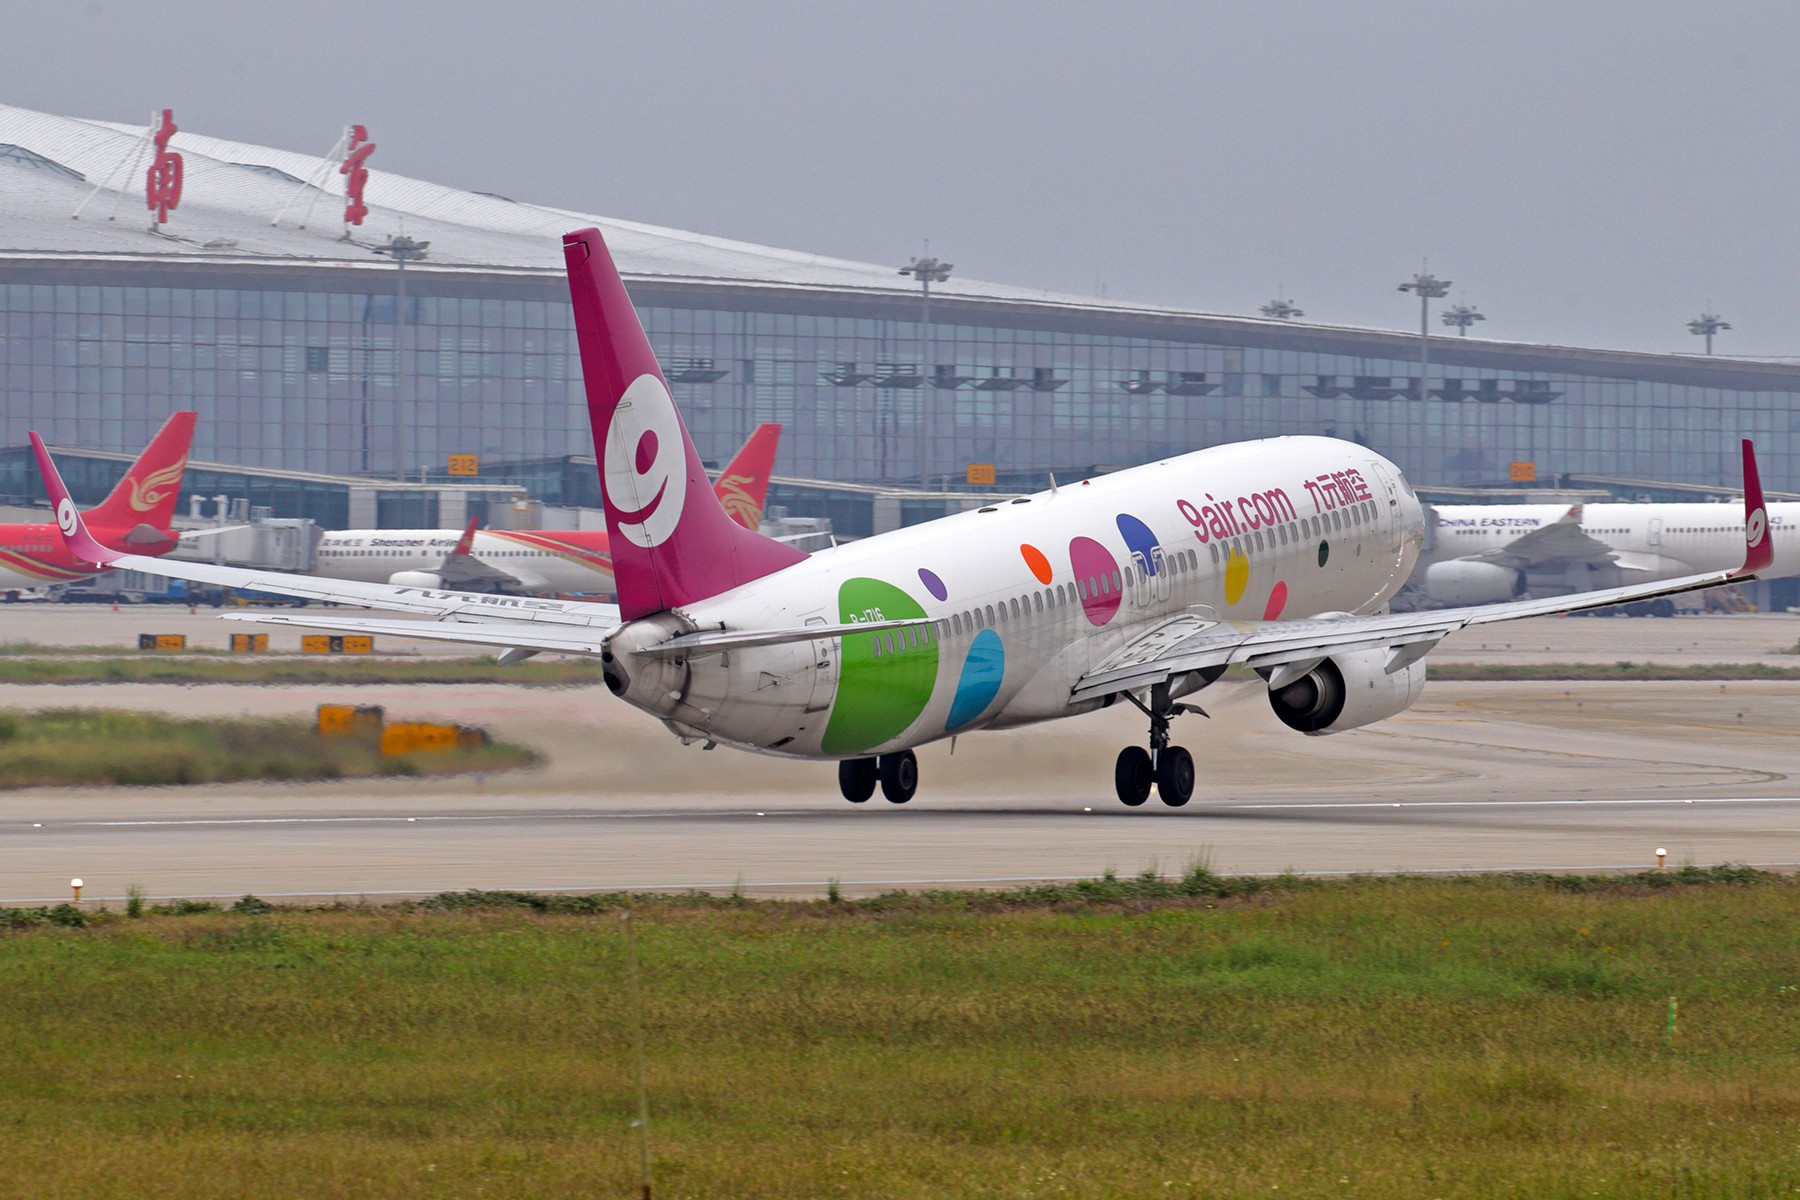 Re:[原创]【BLDDQ】******NKG07/25单跑道运行中****** BOEING 737-800 B-1716 中国南京禄口国际机场